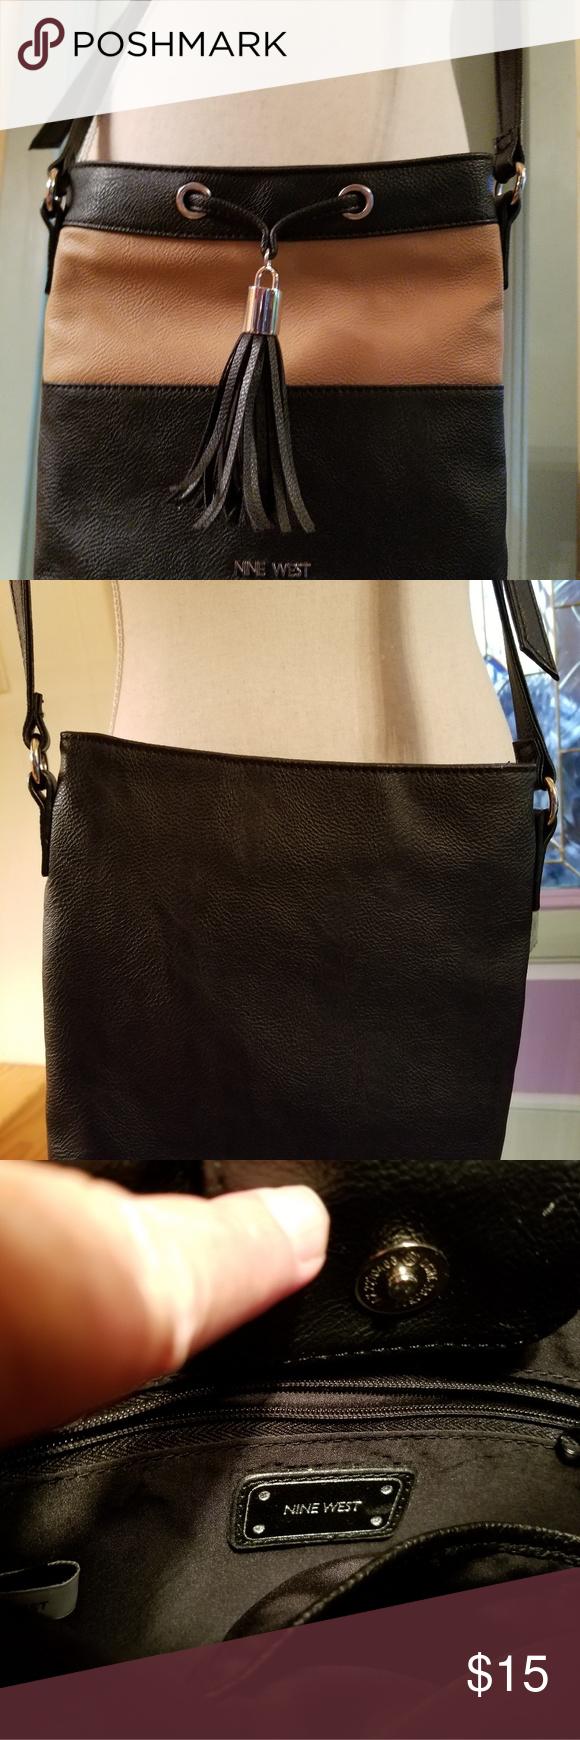 f13b6994bcdb Nine West Crossbody bag Nine West Crossbody bag, 9x9, one slip pocket & one  zip pocket interior. Fringe detail on front. Magnetic snap closure.